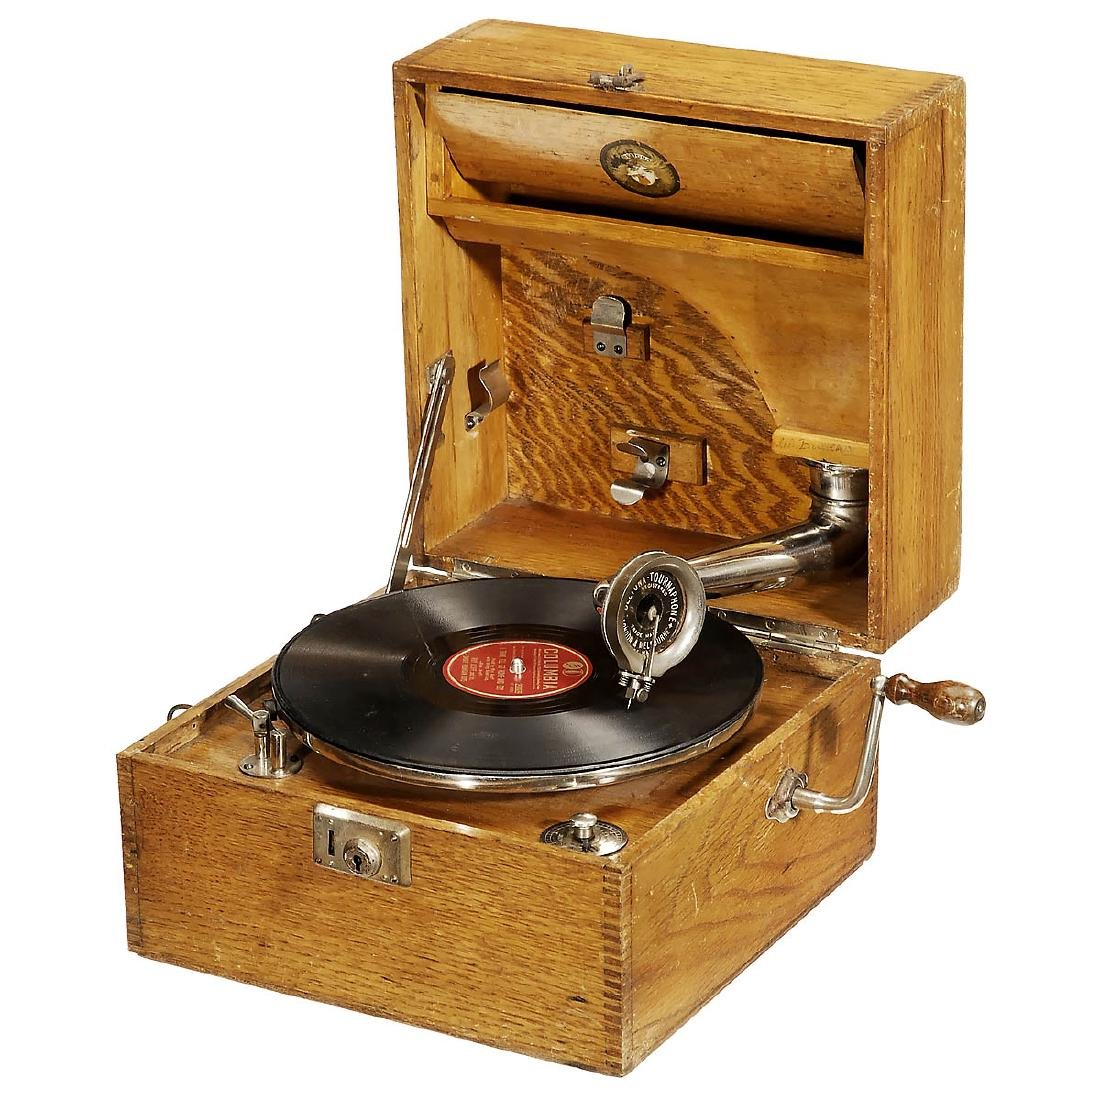 Beltona Portable Gramophone, c. 1925